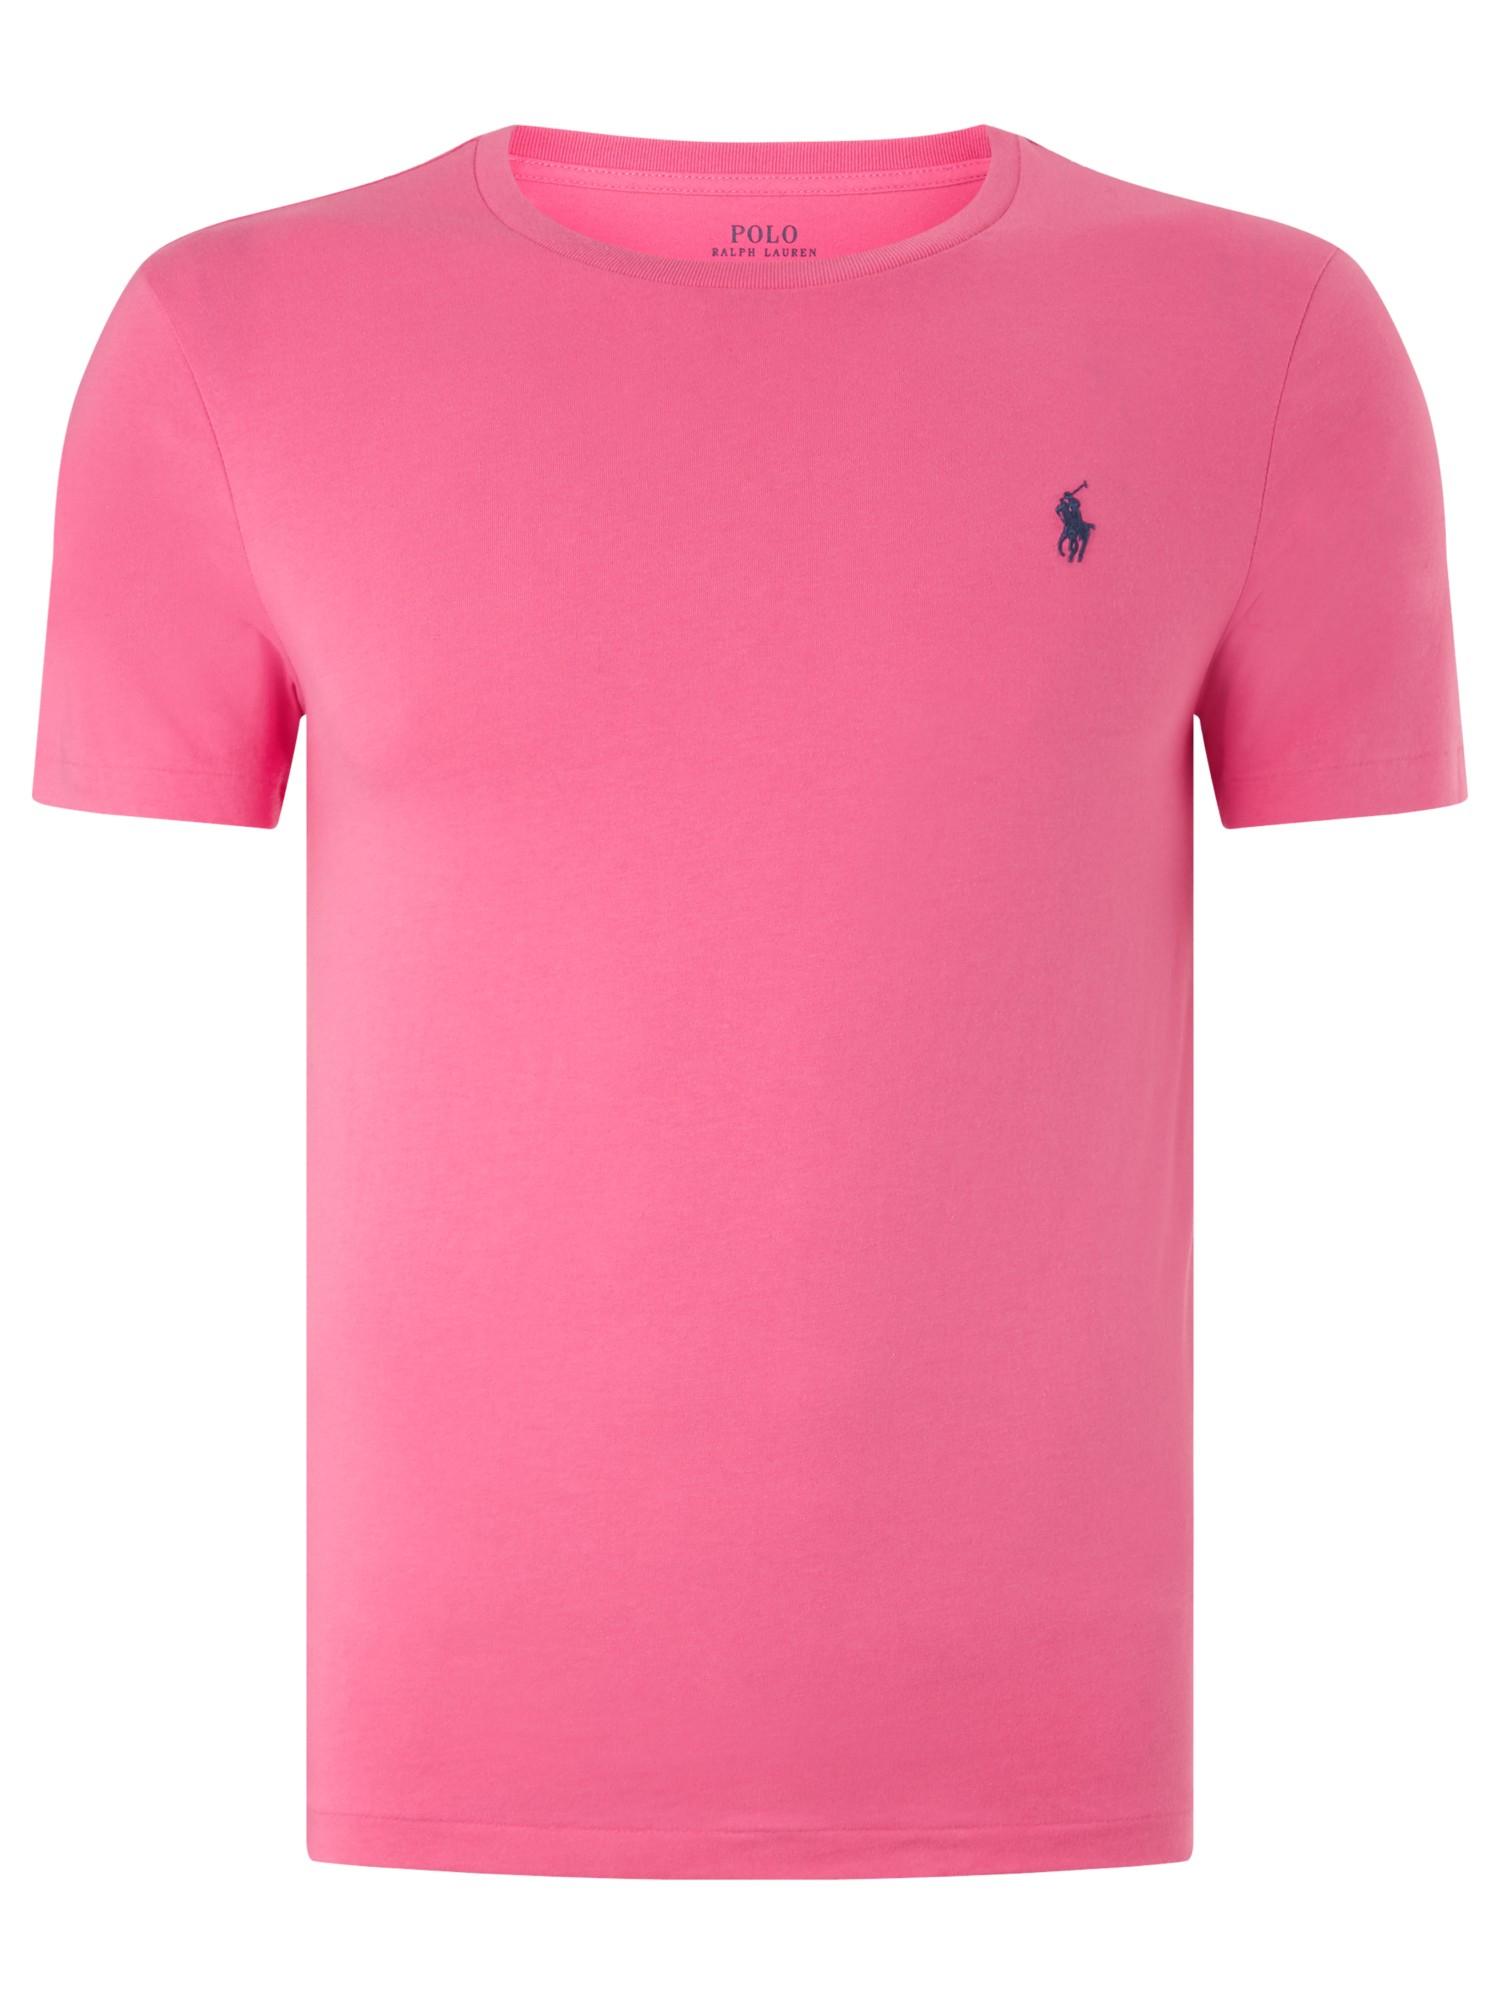 Ralph Lauren Polo Short Sleeve T Shirt In Pink For Men